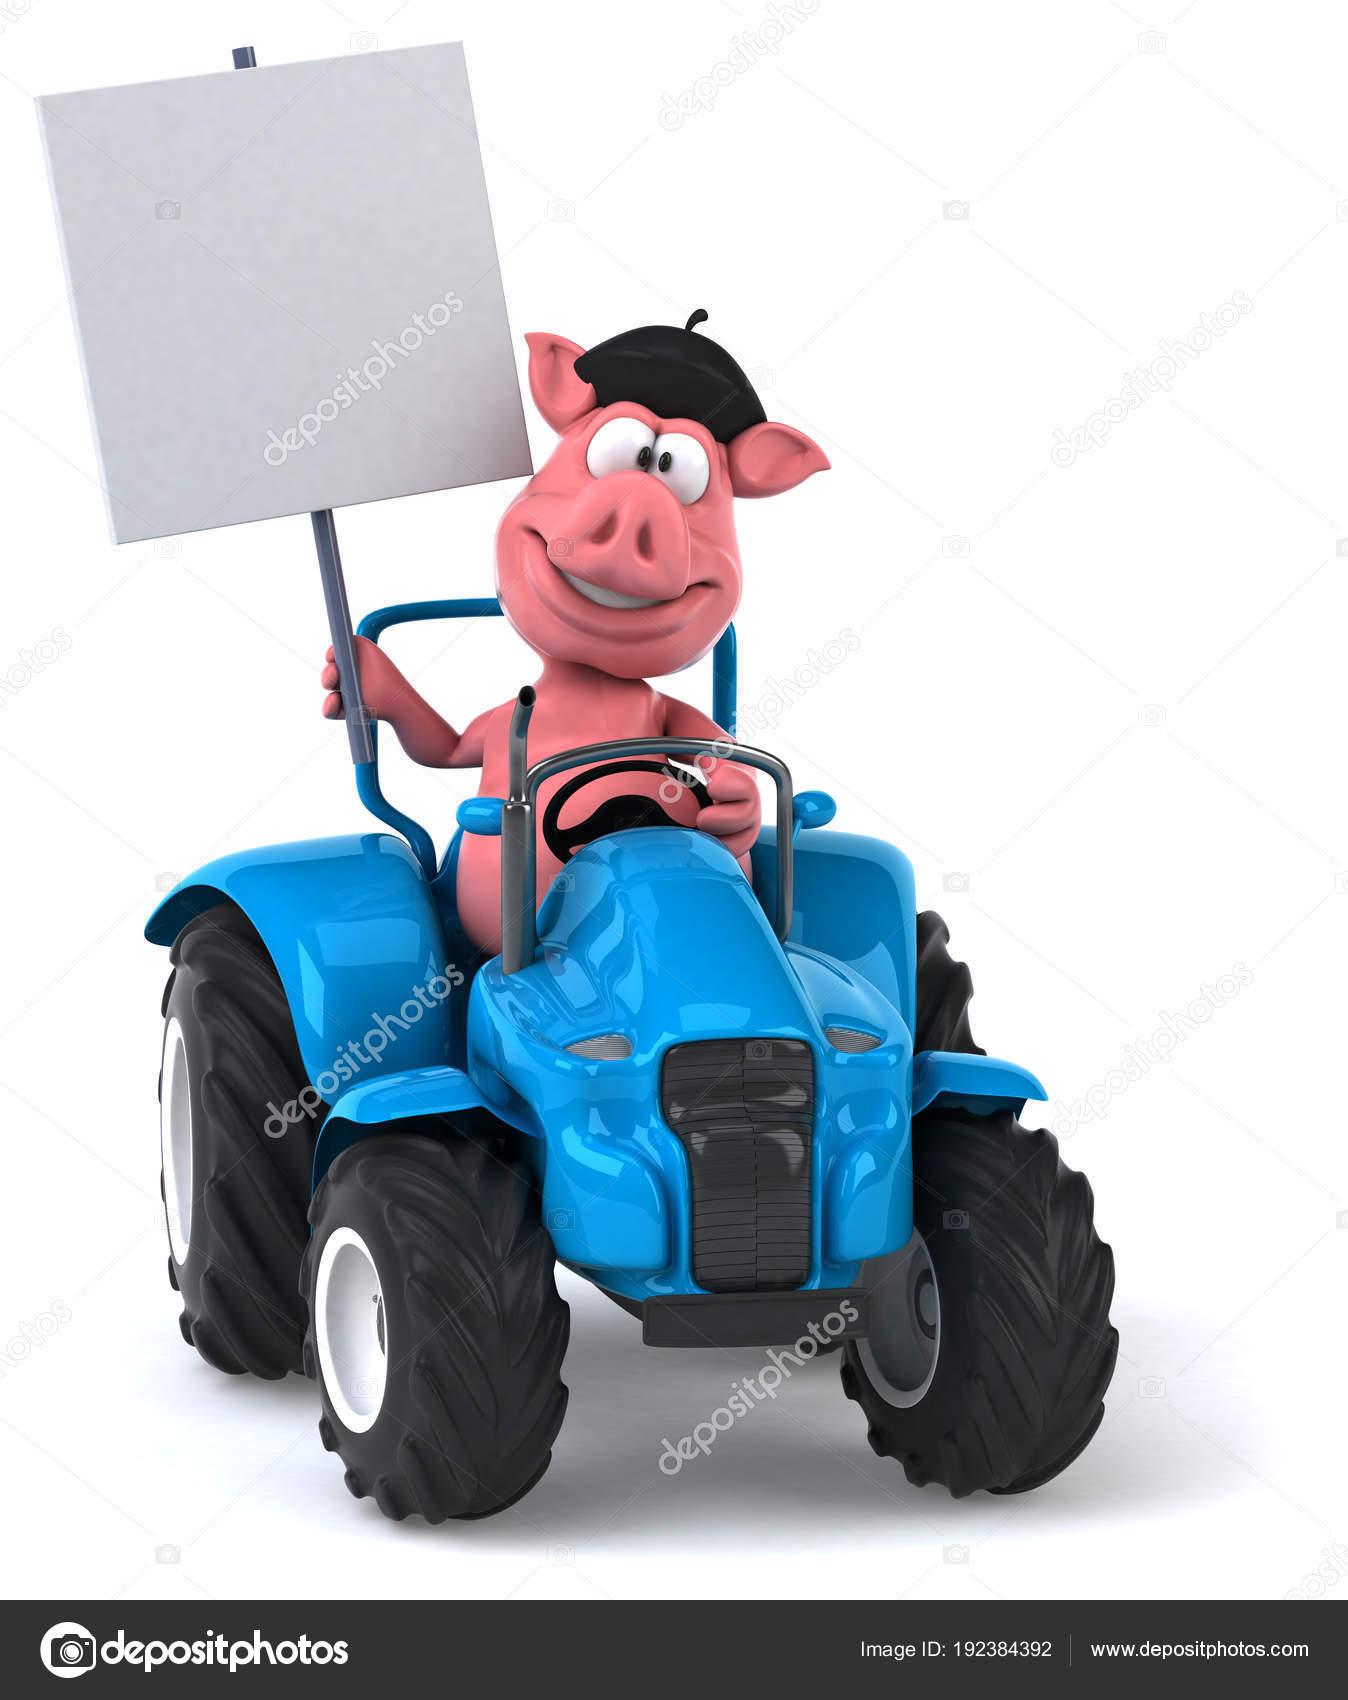 Vtipne Kreslene Postavicky Traktor Obrazek Stock Fotografie